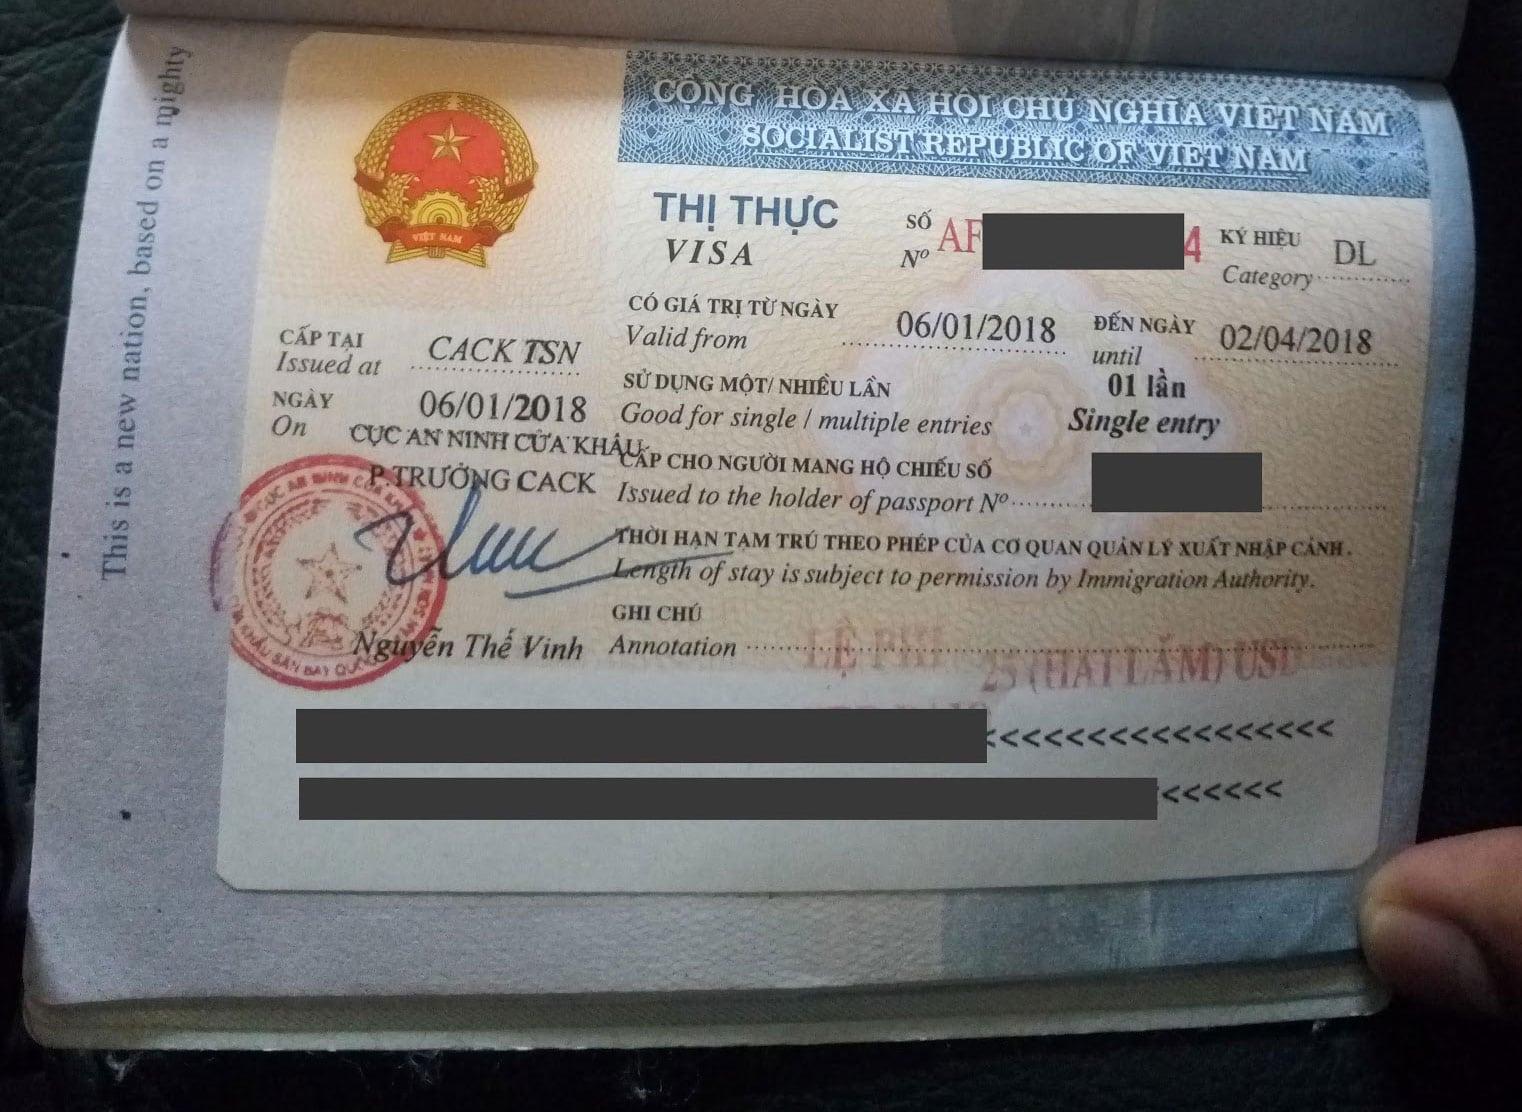 3 months Single entry visa